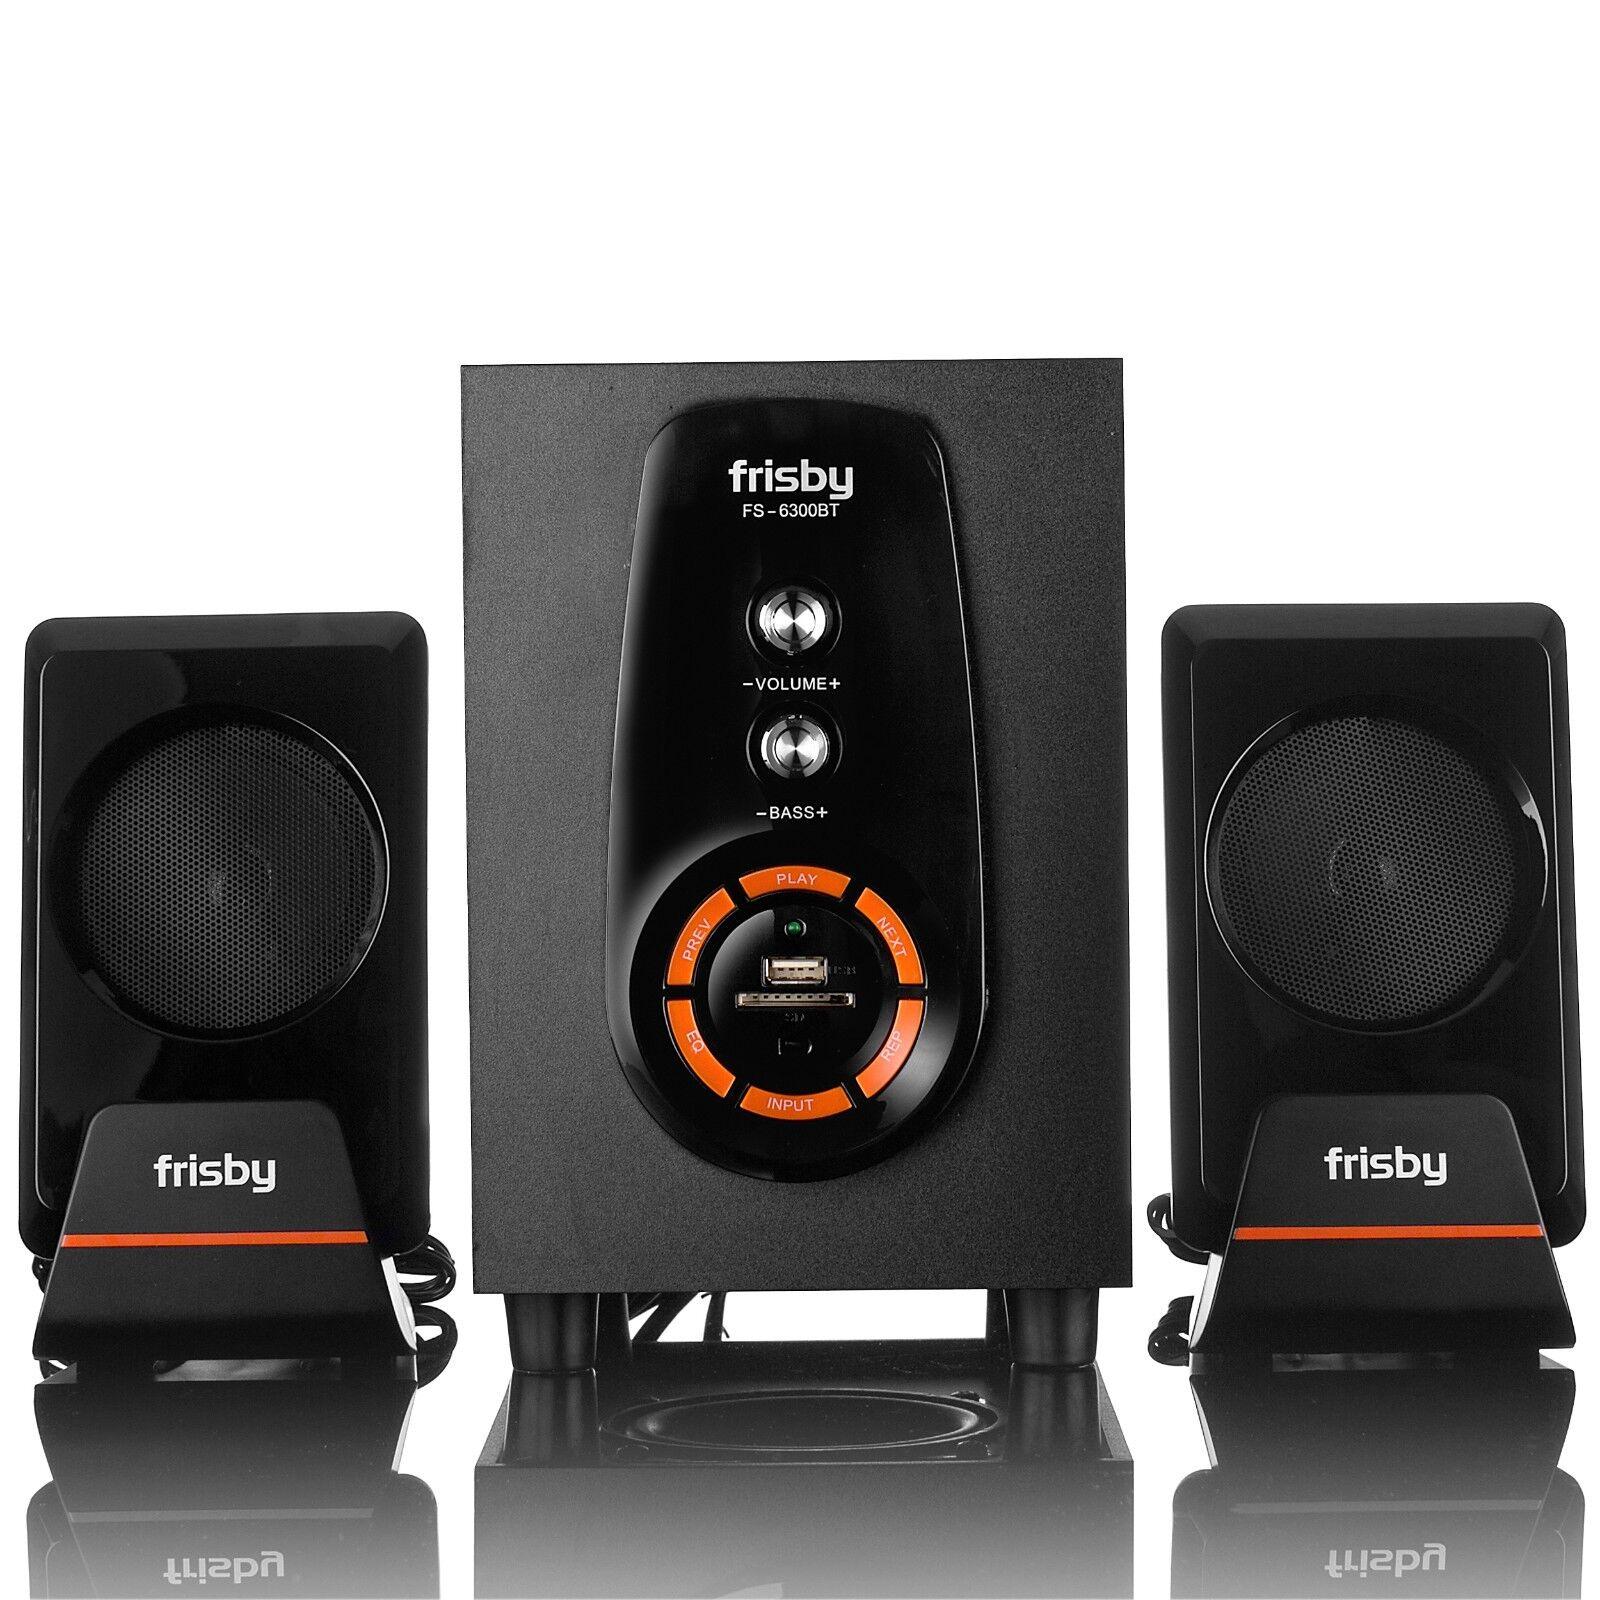 Frisby FS-6300BT Bluetooth Wireless 2.1 CH Subwoofer Speaker